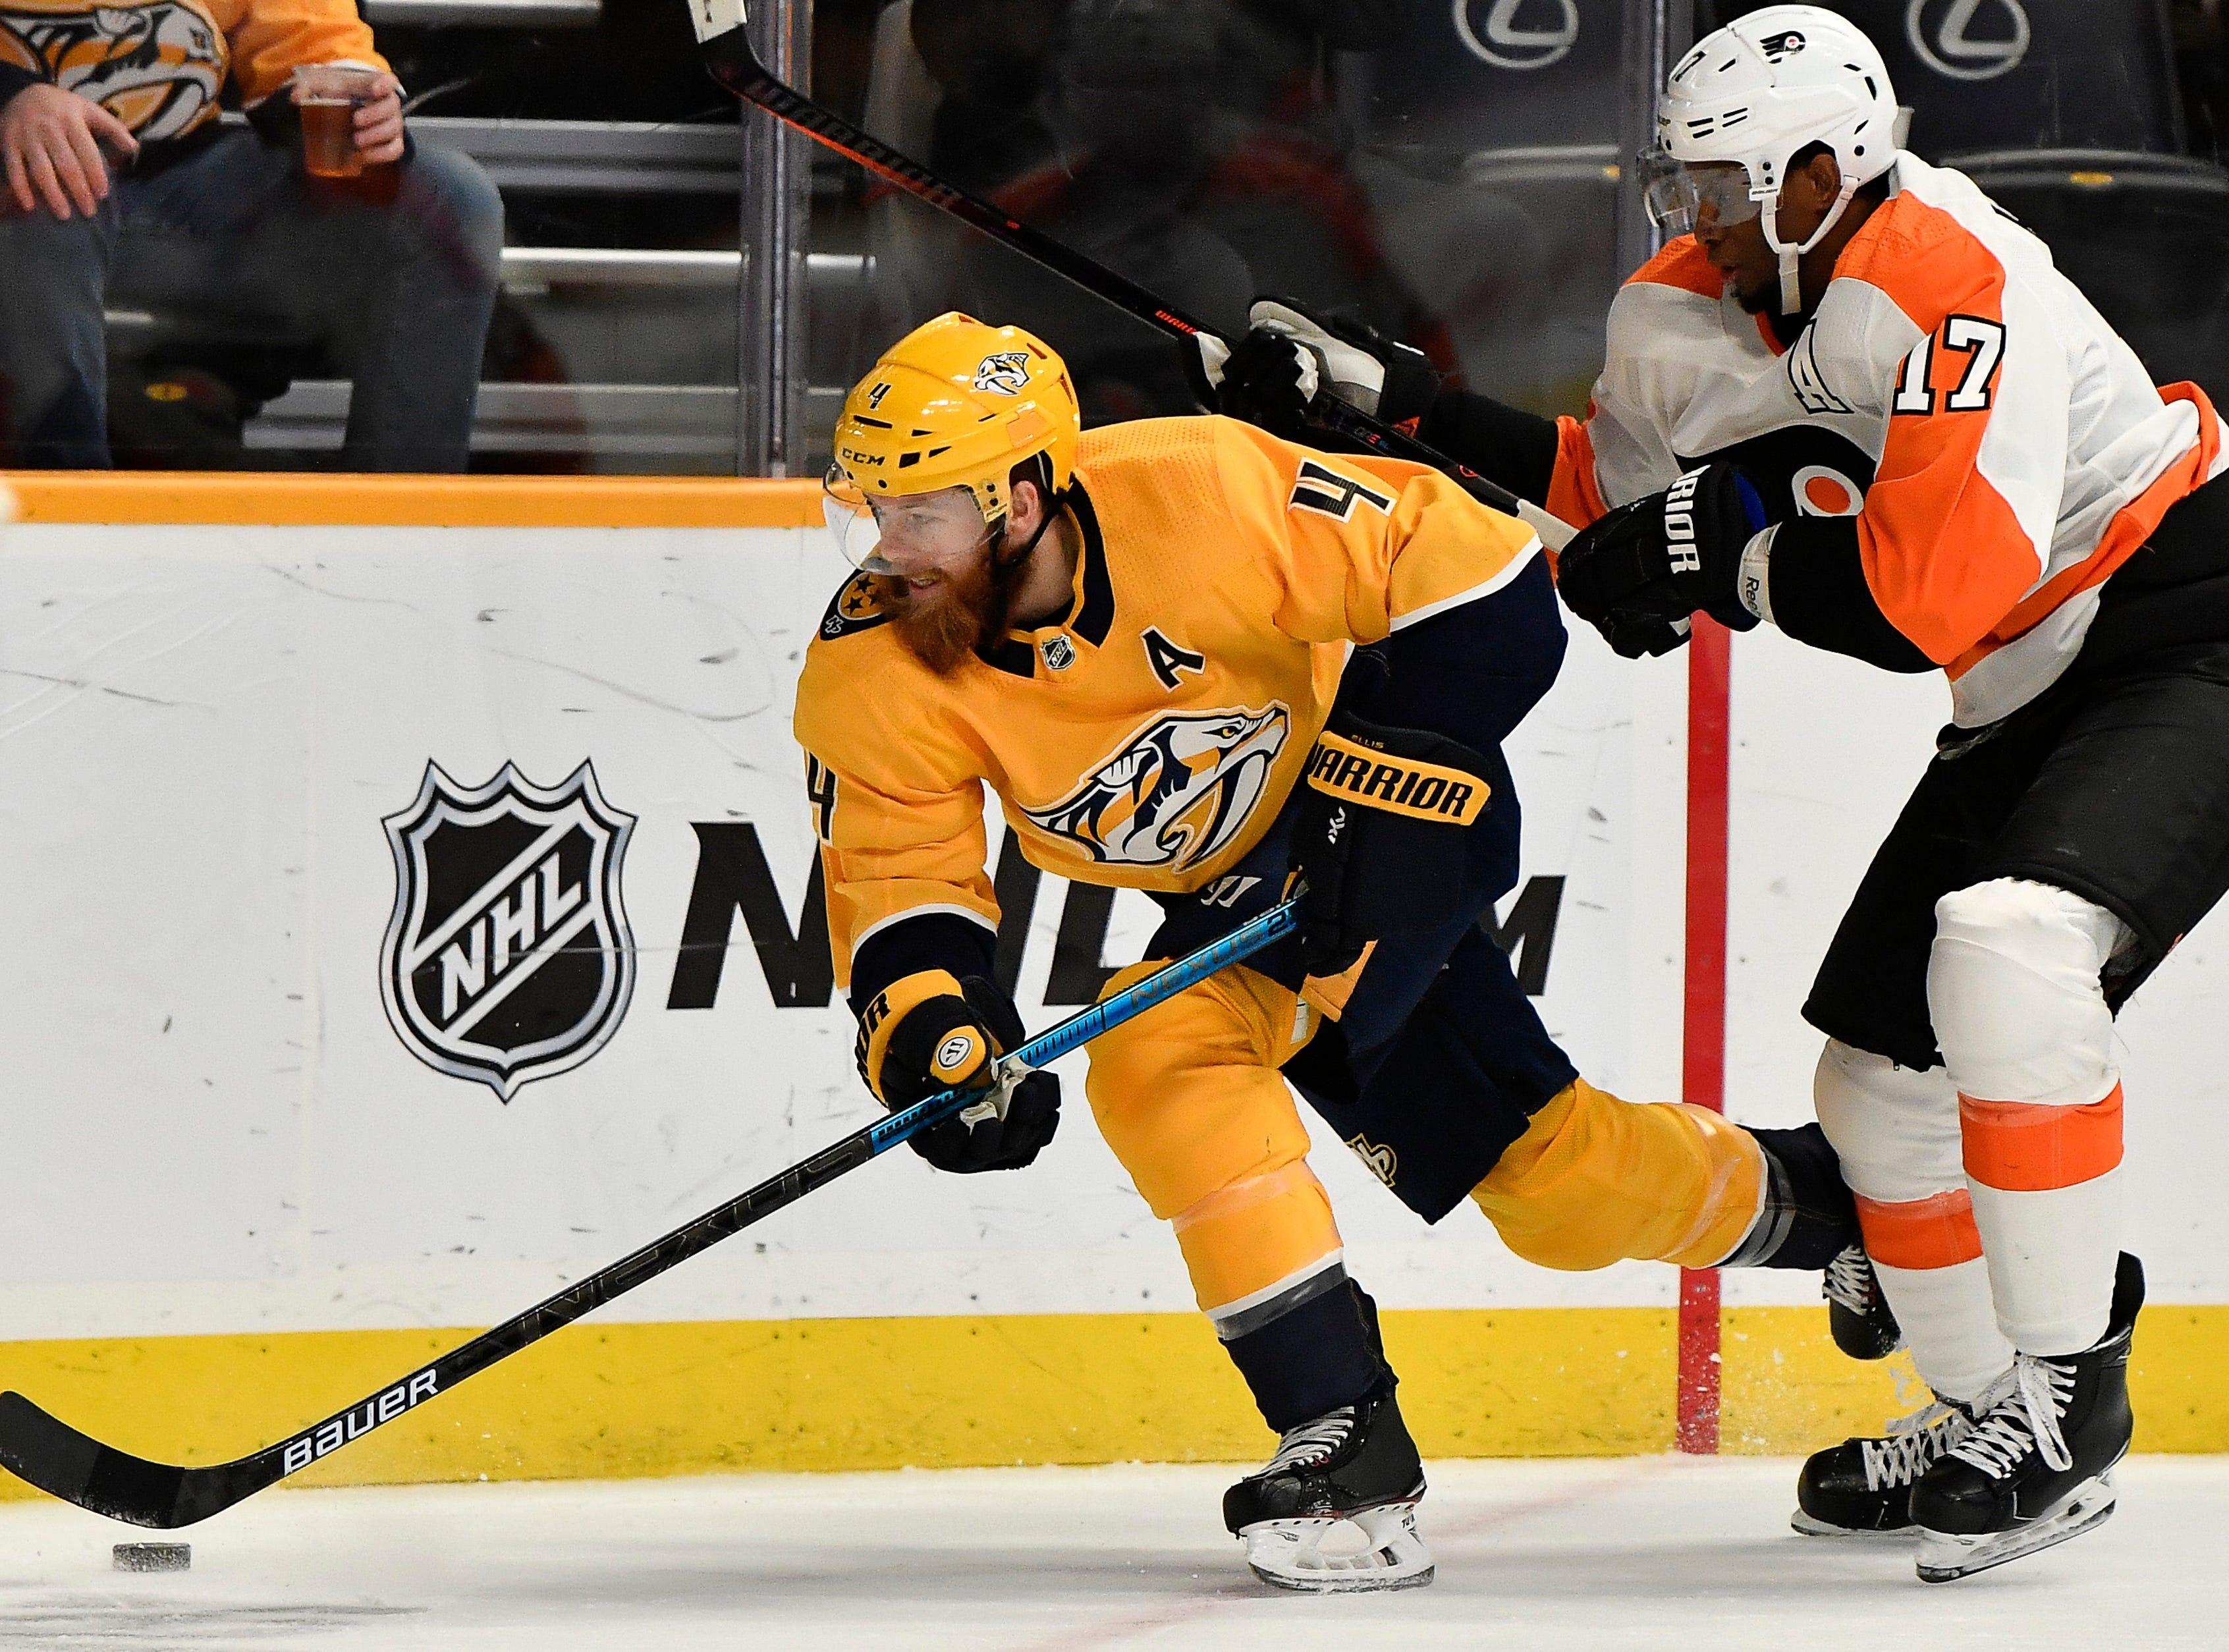 Predators defenseman Ryan Ellis (4) takes the puck from Flyers right wing Wayne Simmonds (17) during the second period at Bridgestone Arena Tuesday, Jan. 1, 2019, in Nashville, Tenn.